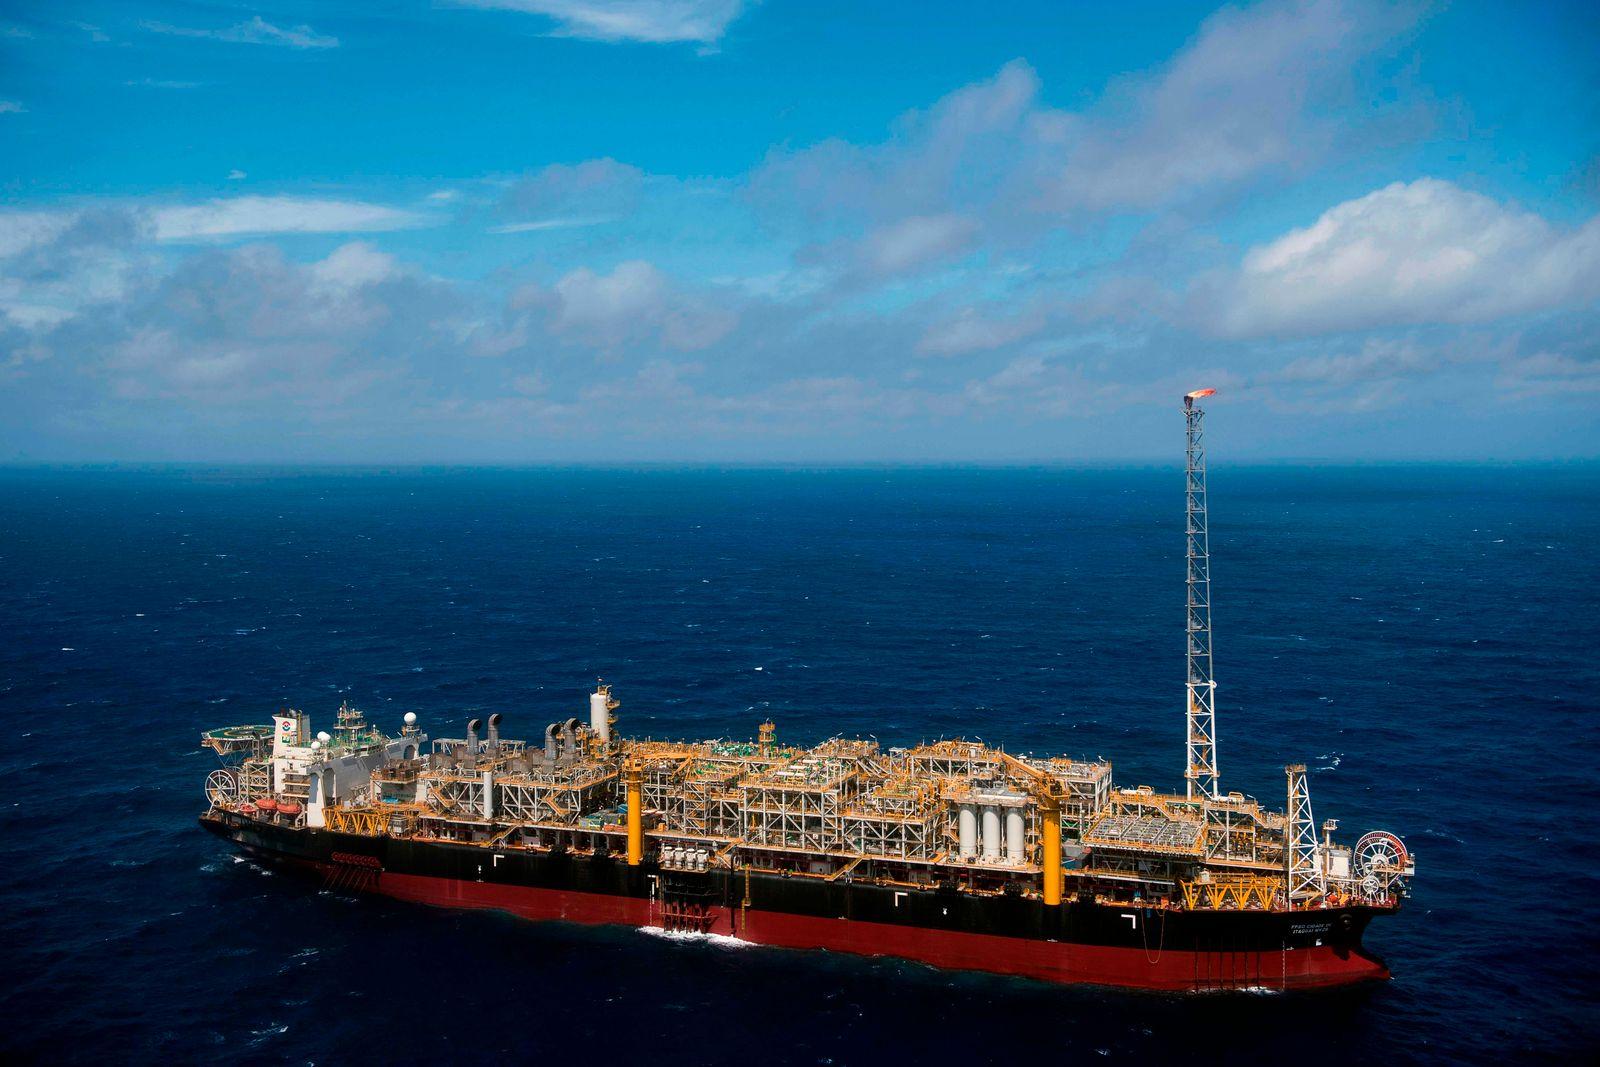 Petrobras / Ölbohrschiff